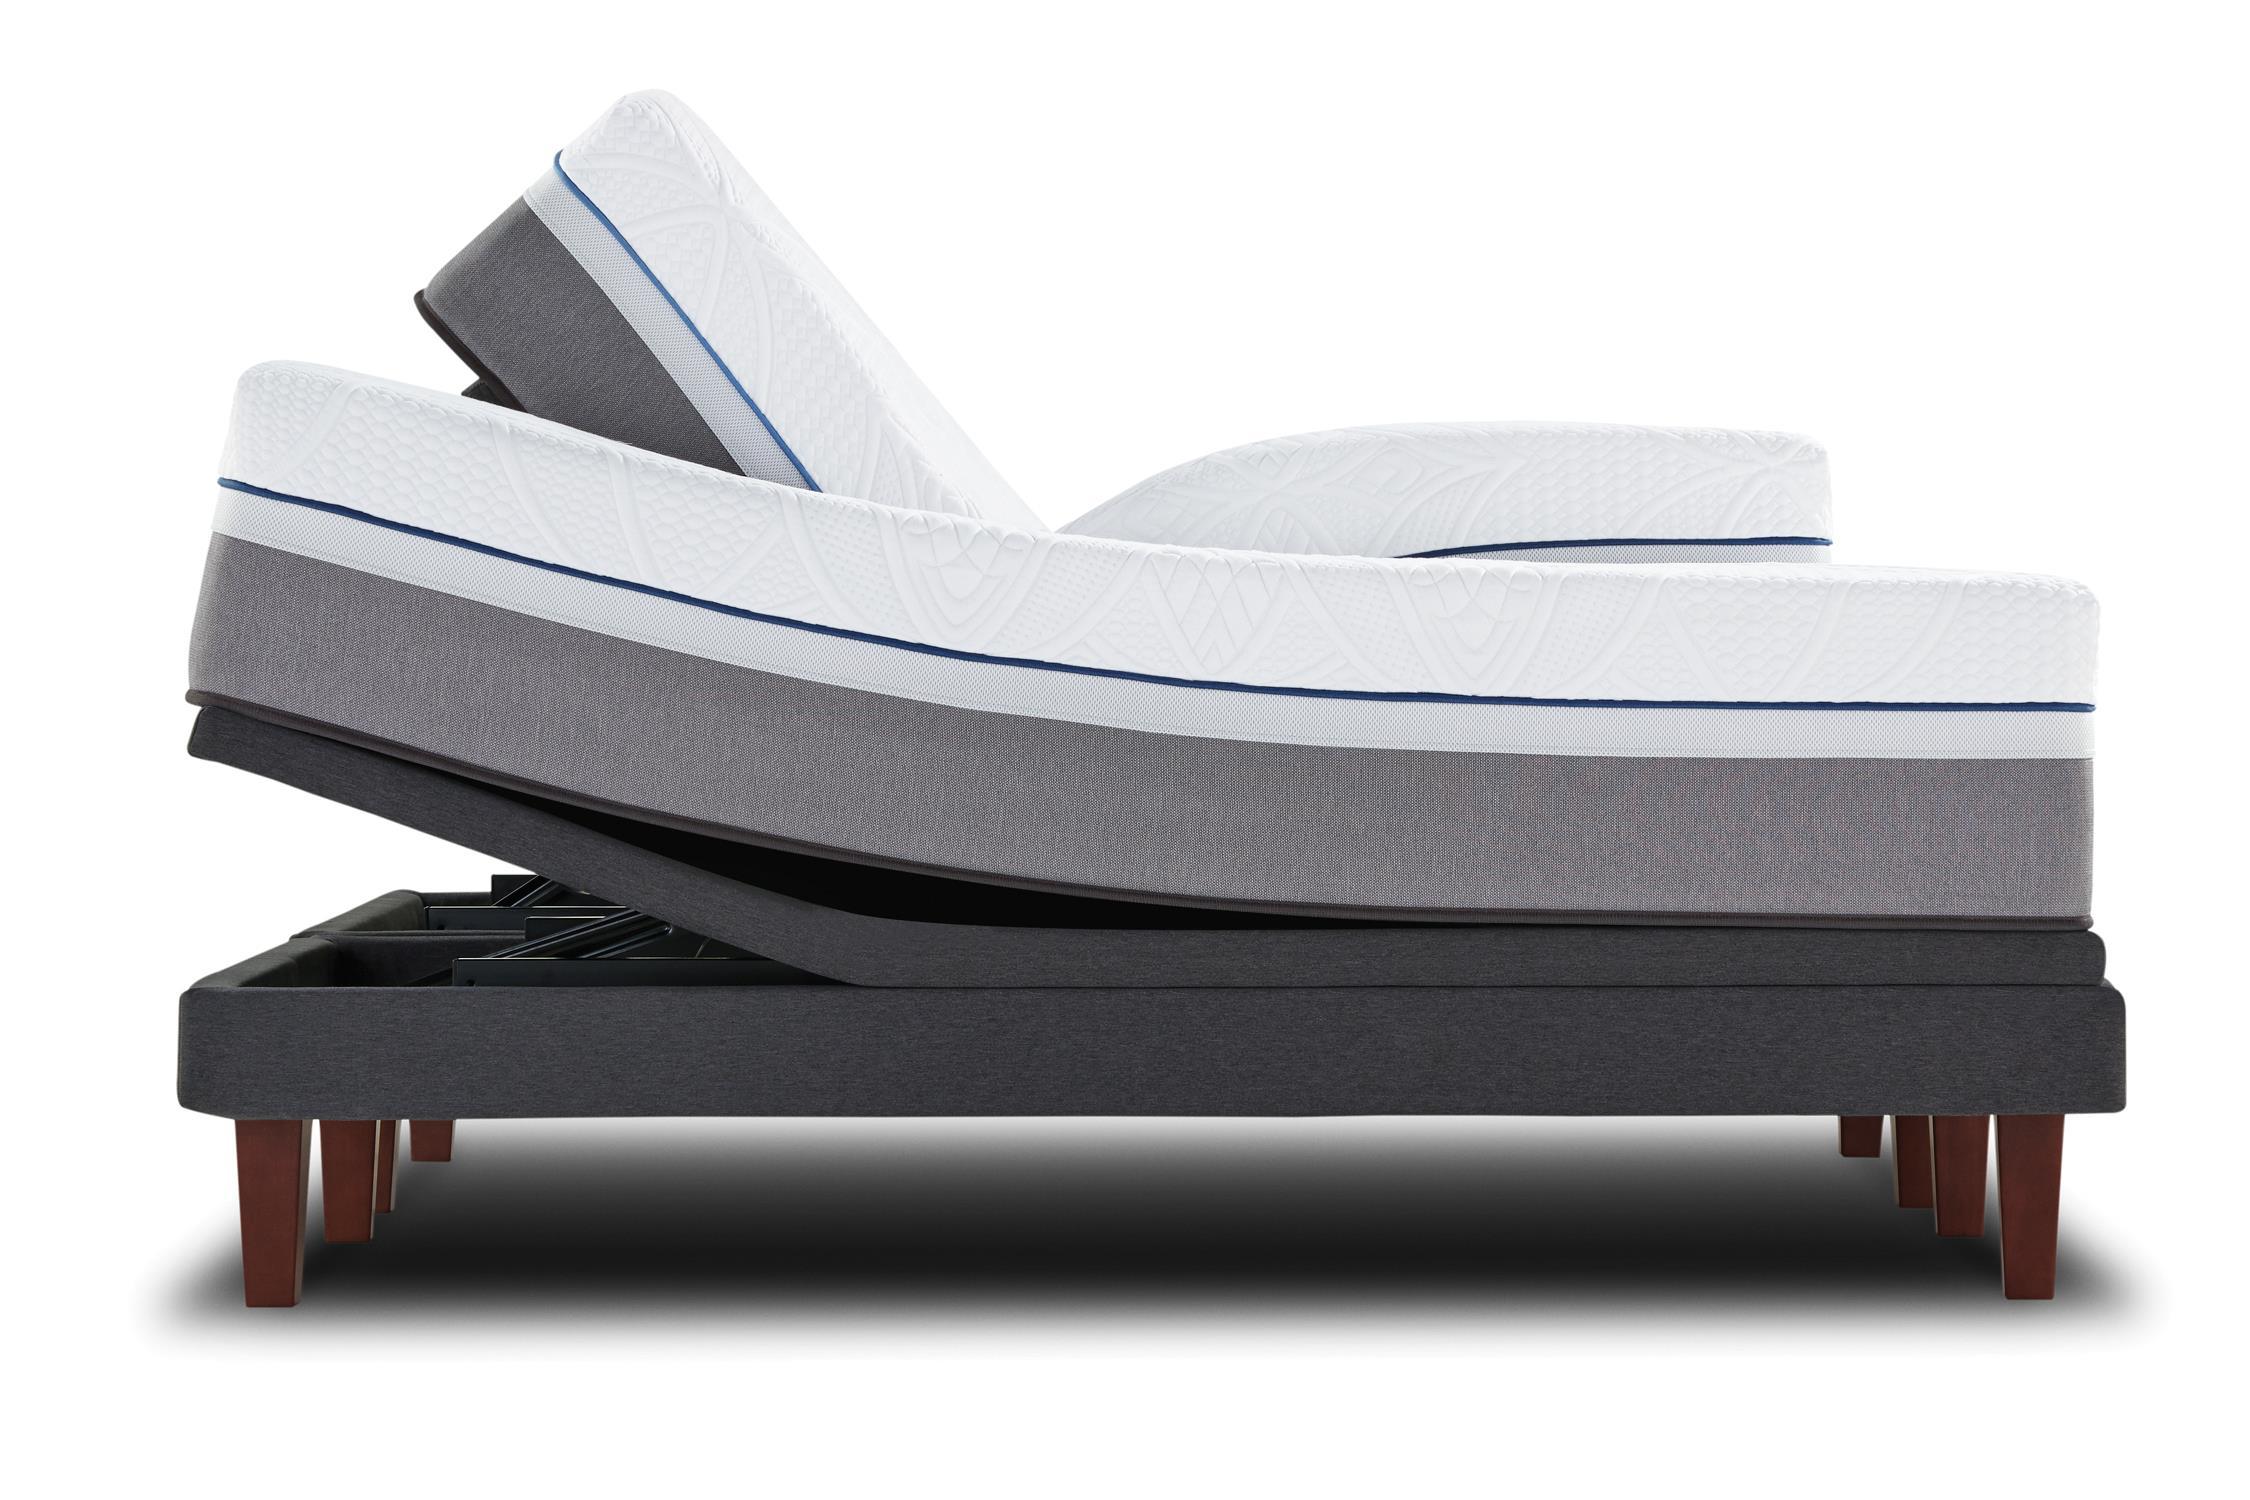 Sealy Posturepedic Hybrid Copper Twin XL Plush Hybrid Mattress Adj Set - Item Number: PlushHybrid-TXL+609663TXL